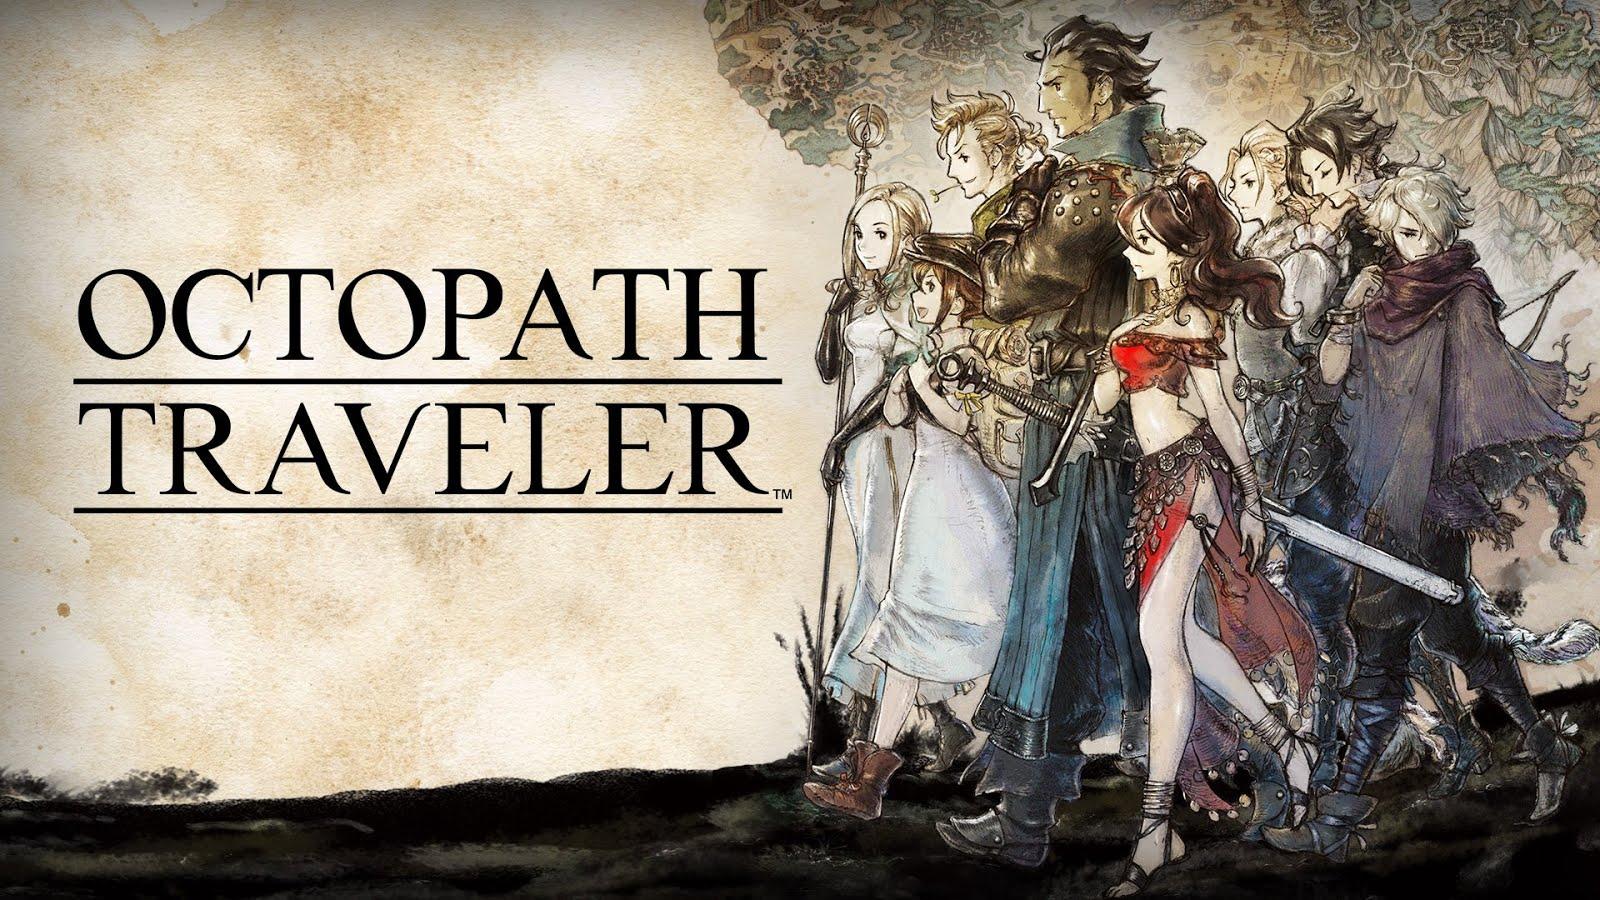 Buy Octopath Traveler